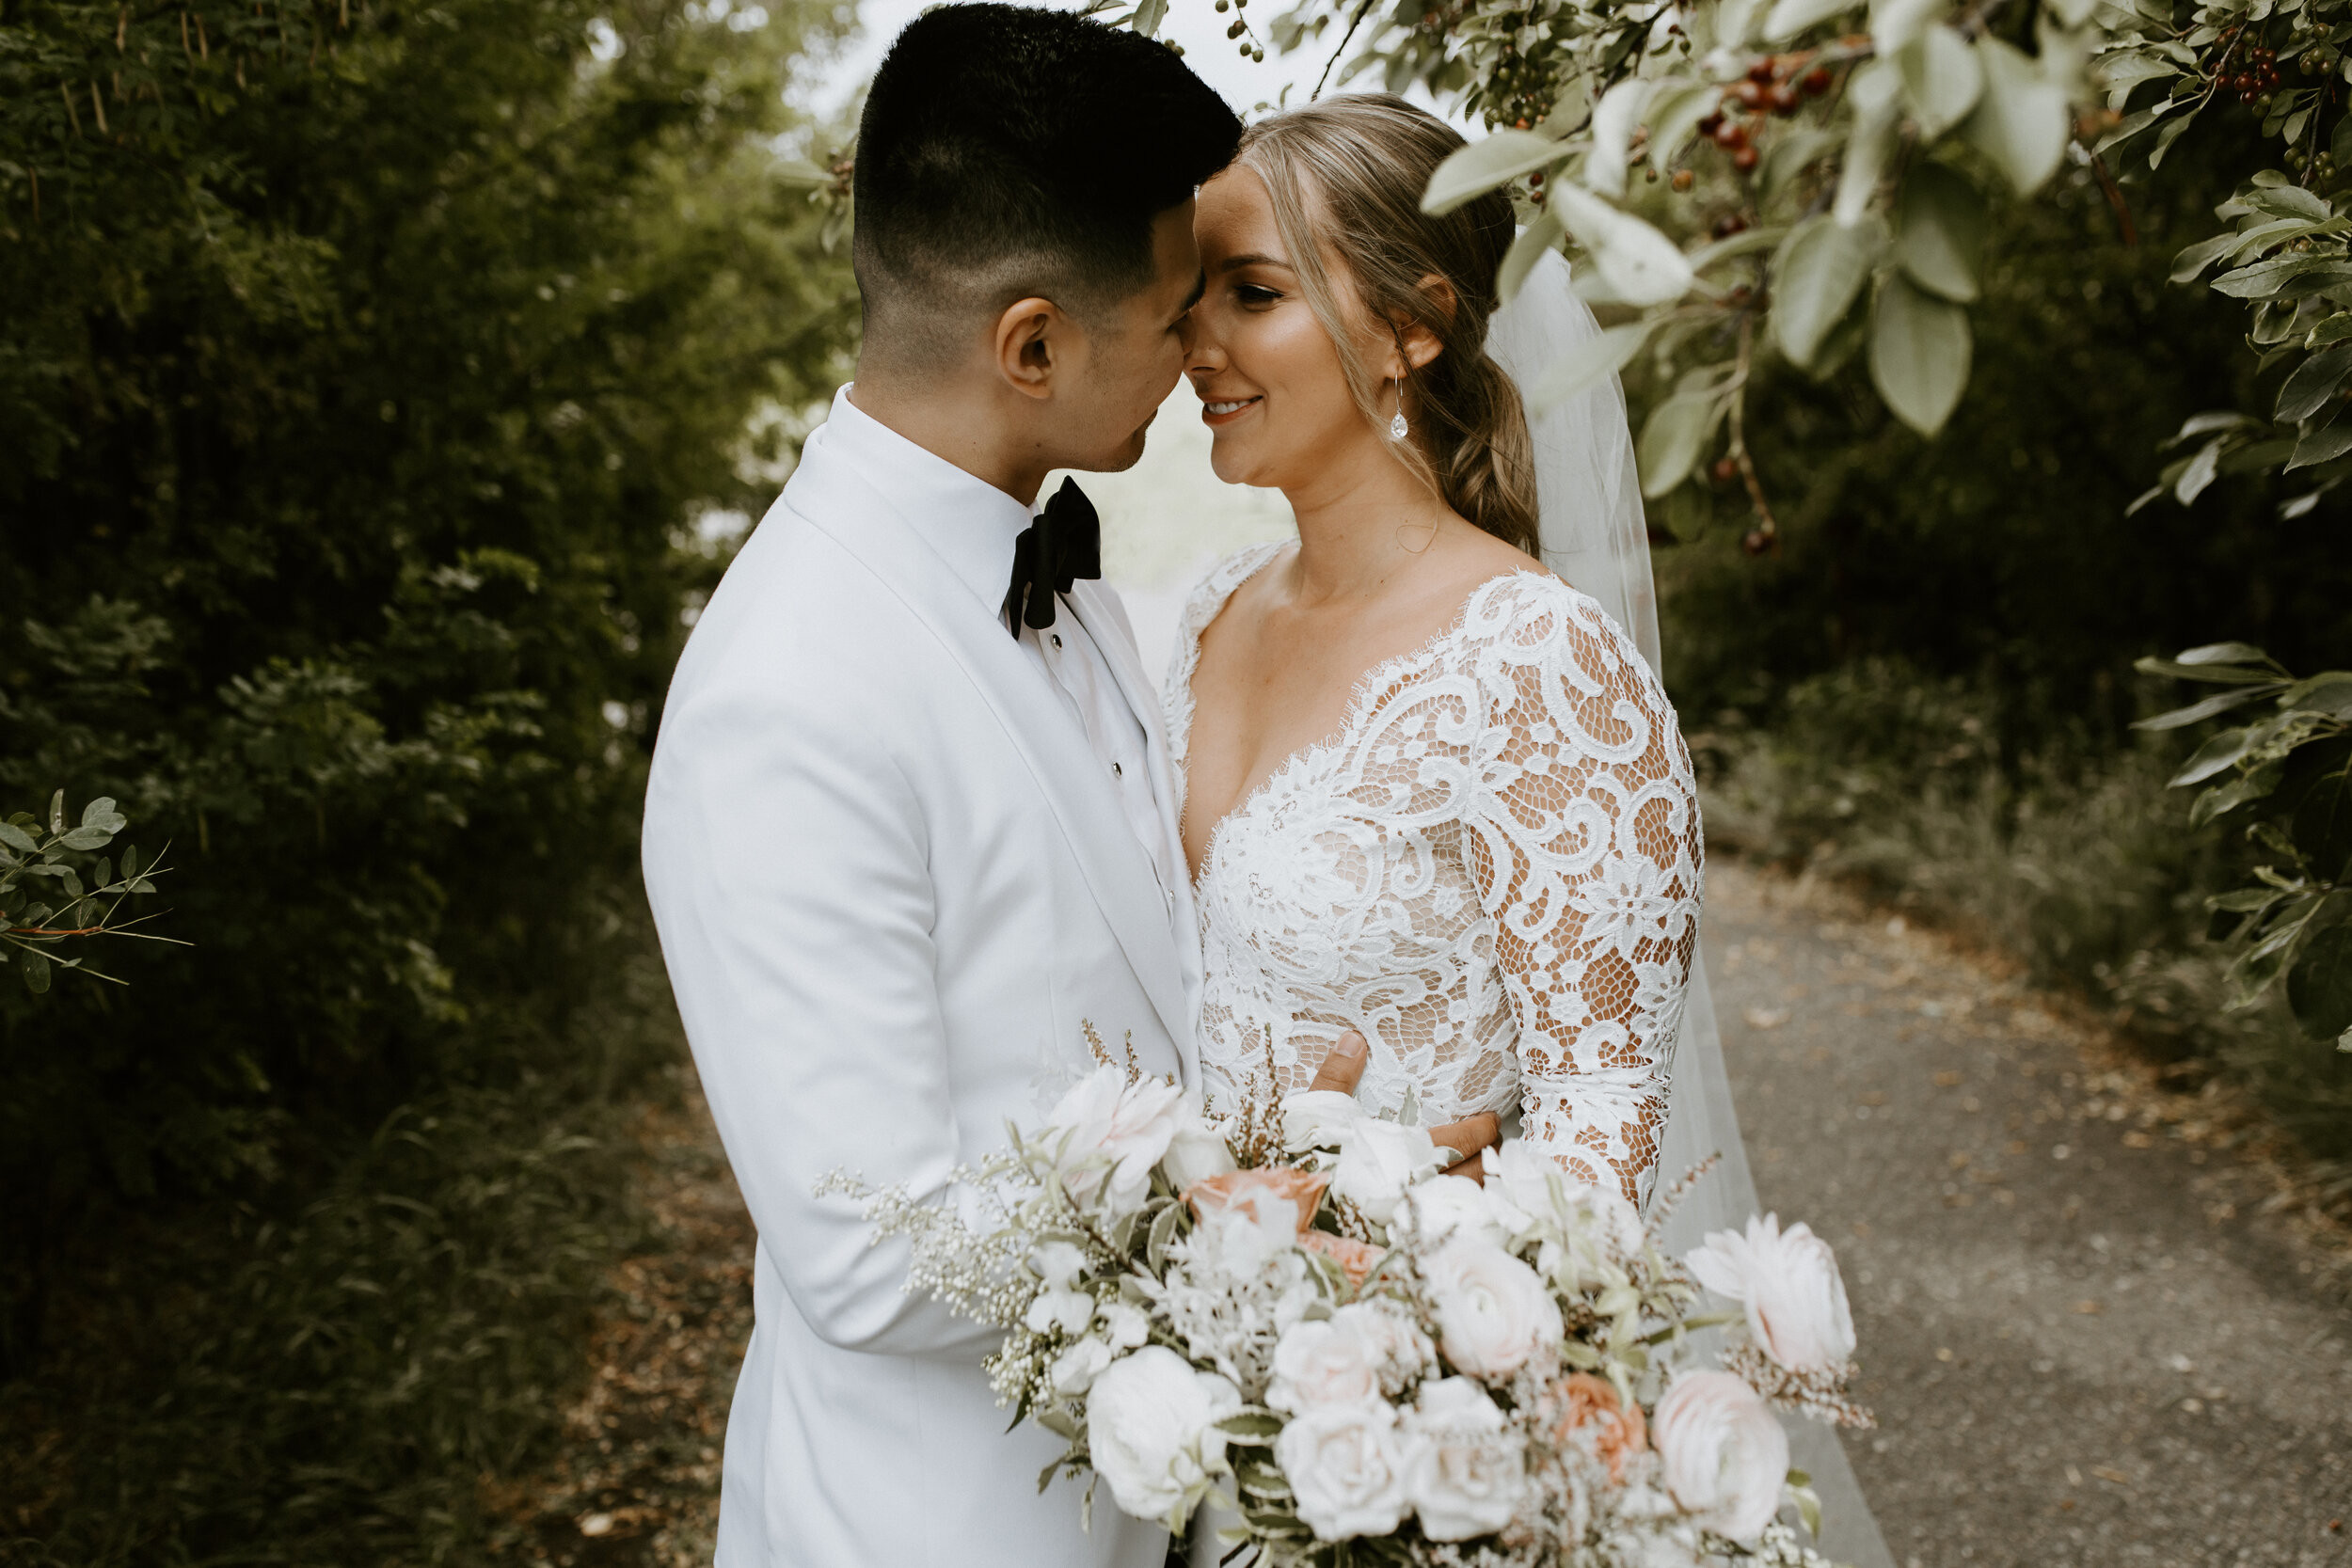 Bride and Groom - Wedding Style Inspiration